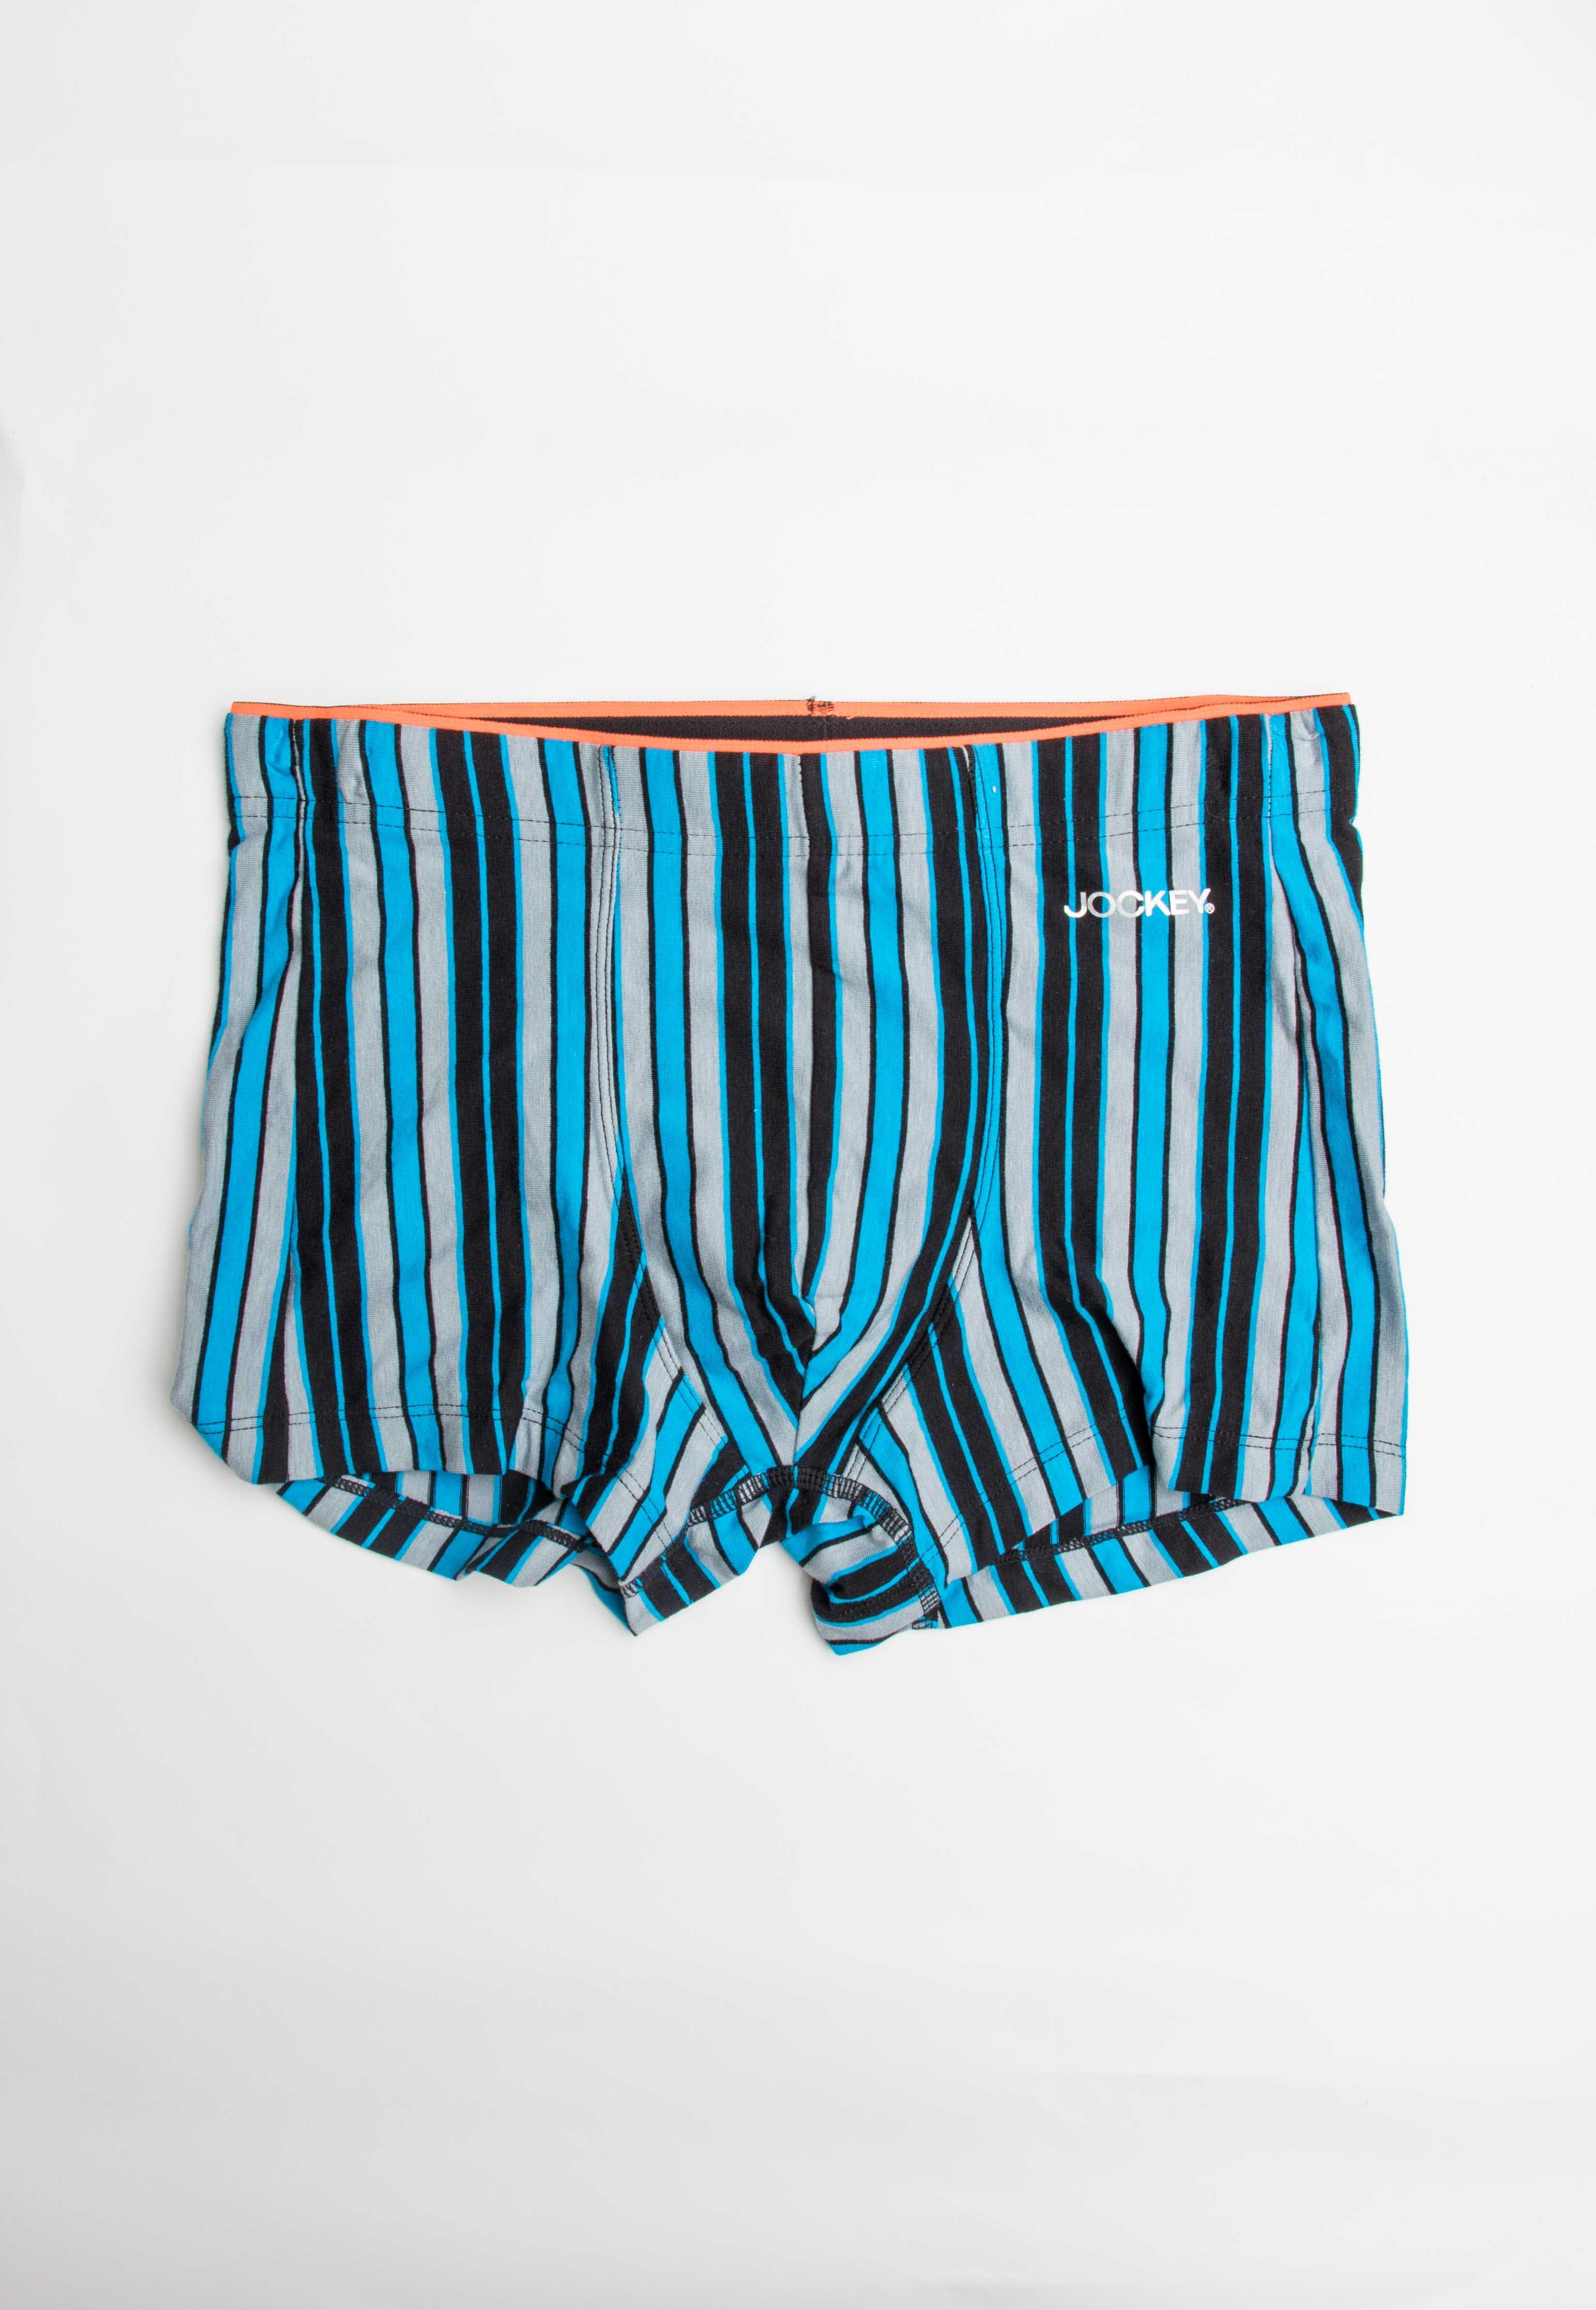 Jockey - Instinct Trunk - Stripe 81